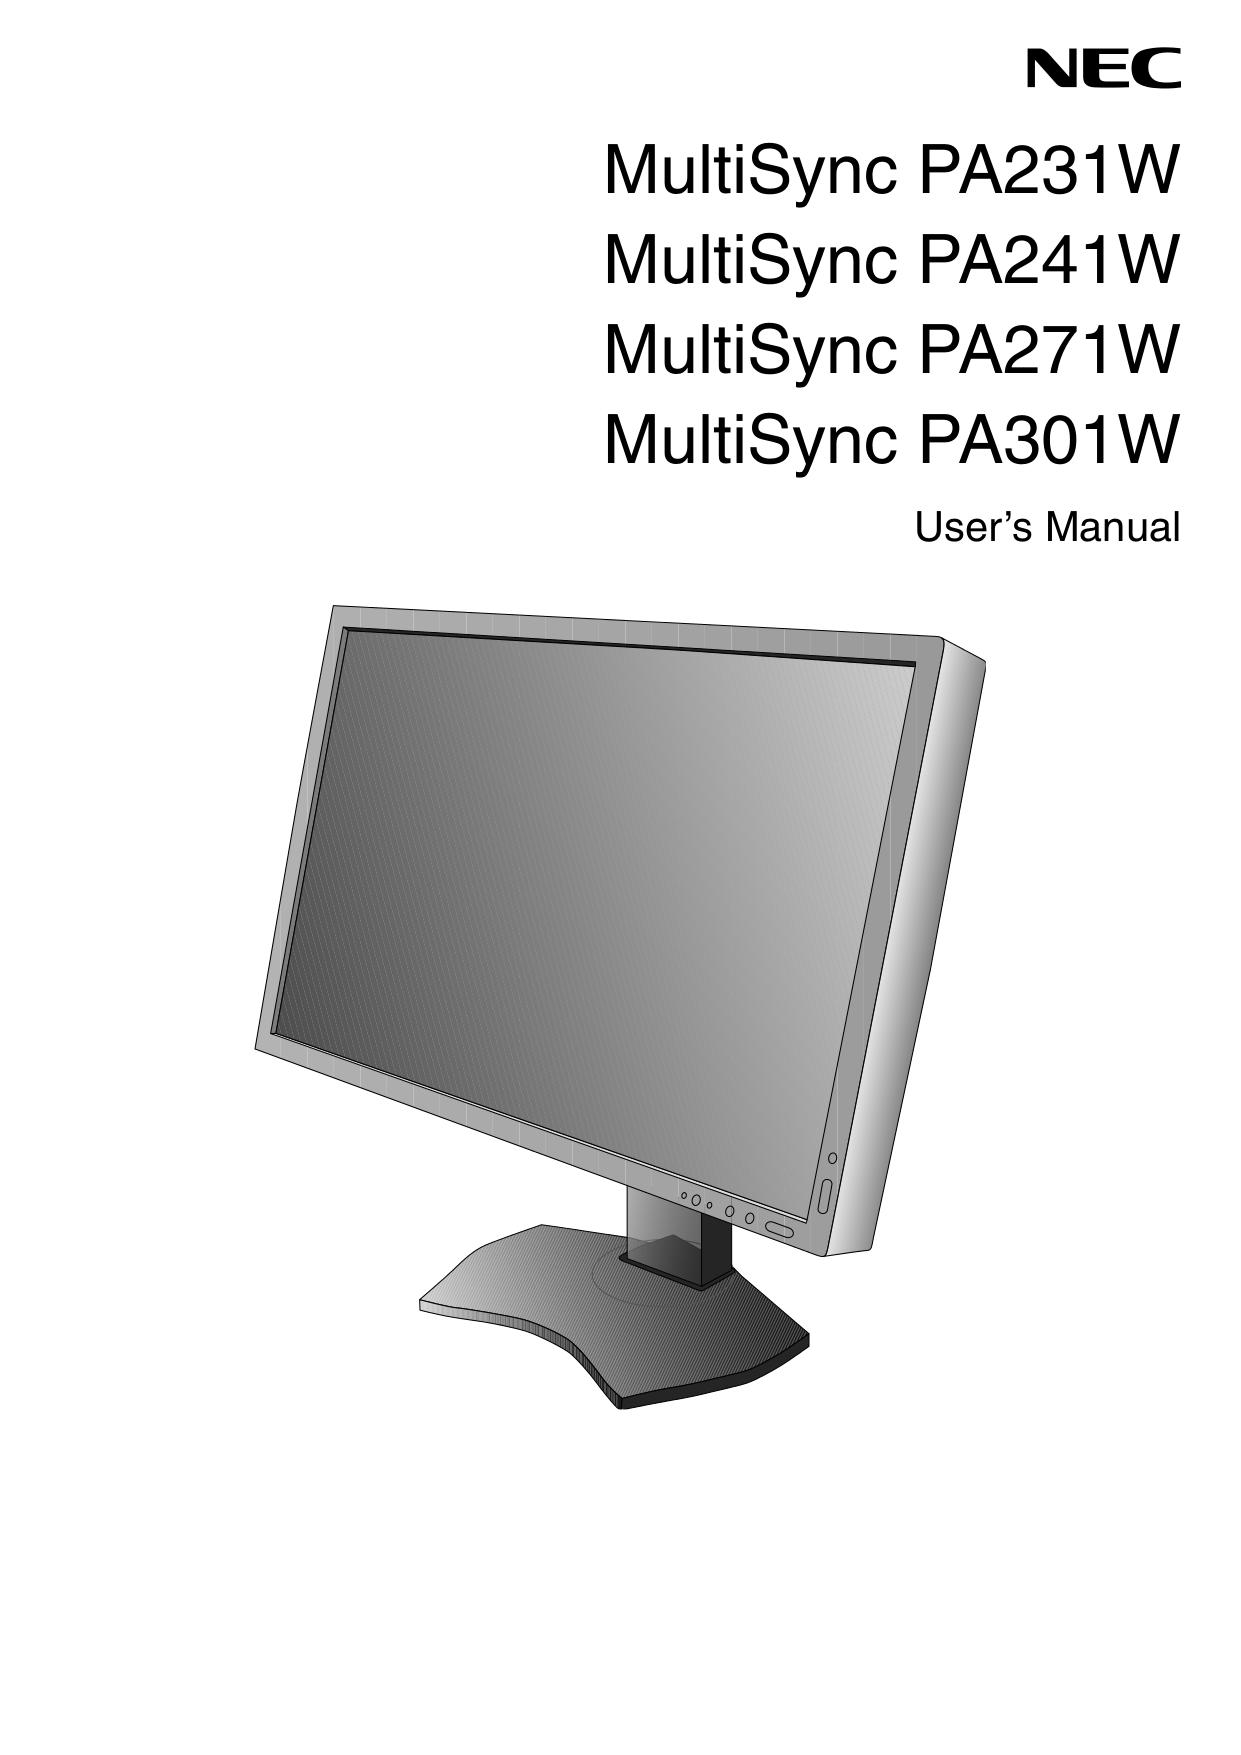 pdf manual for nec monitor multisync 125